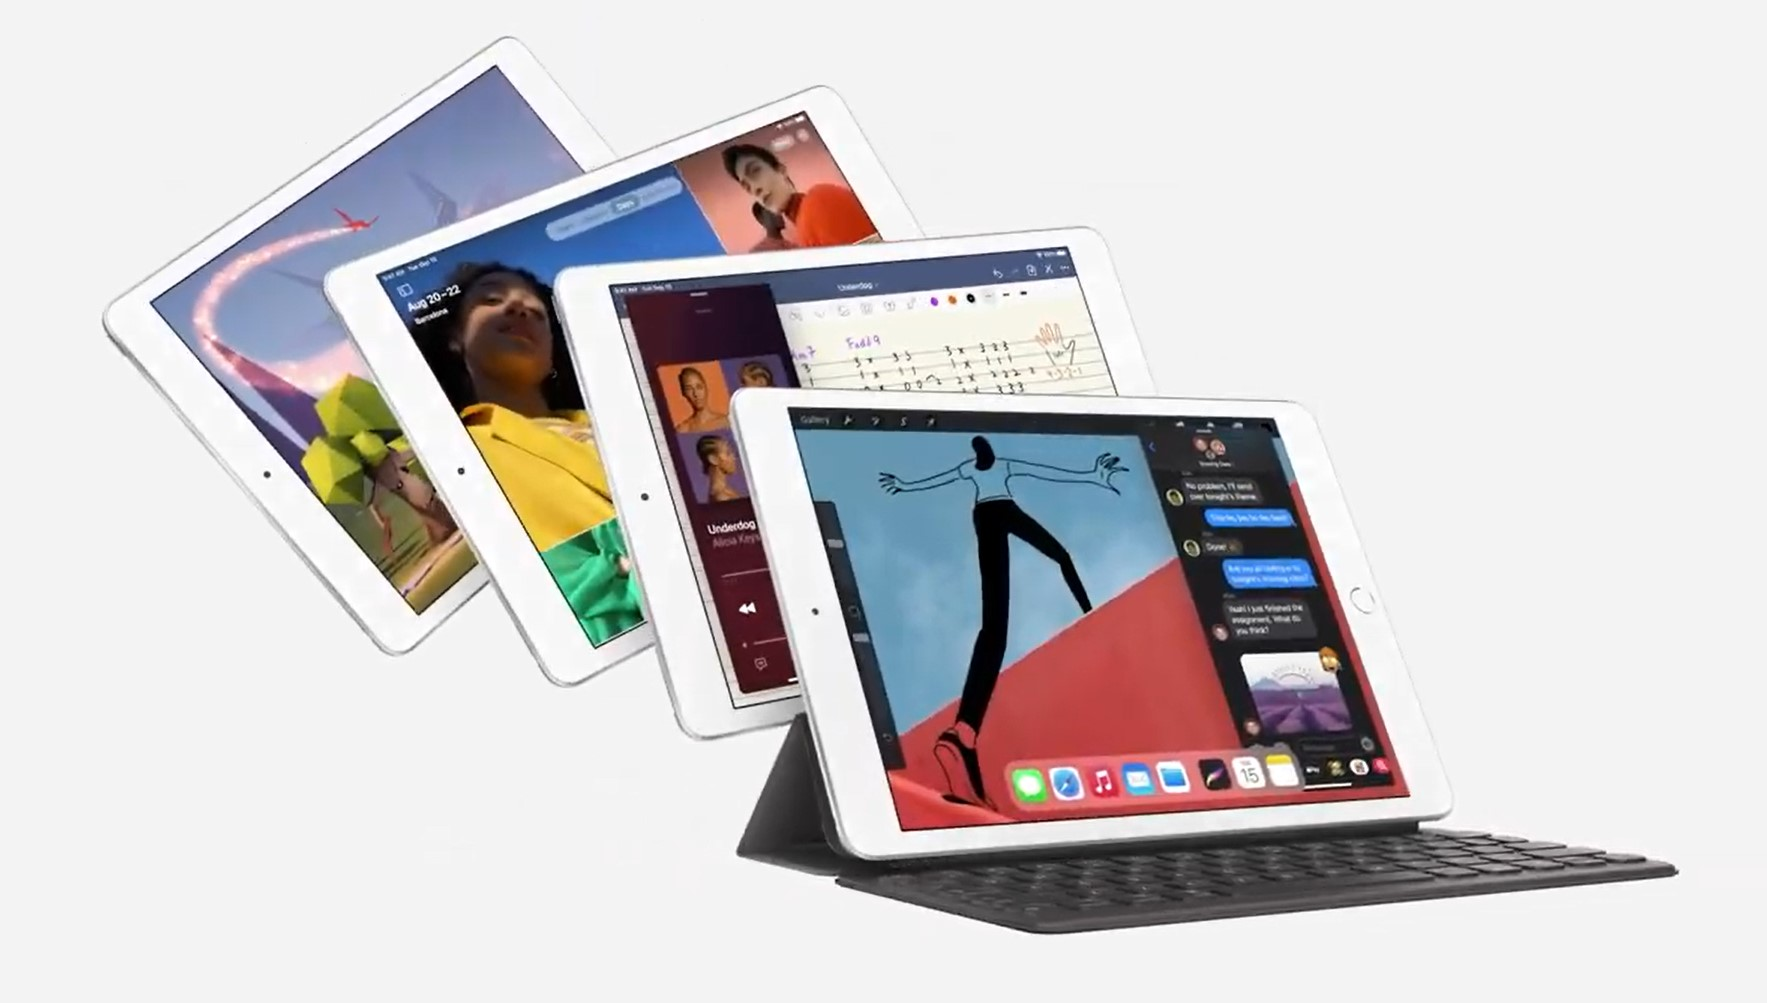 iPad (8th Gen) array with final iPad in a keyboard case